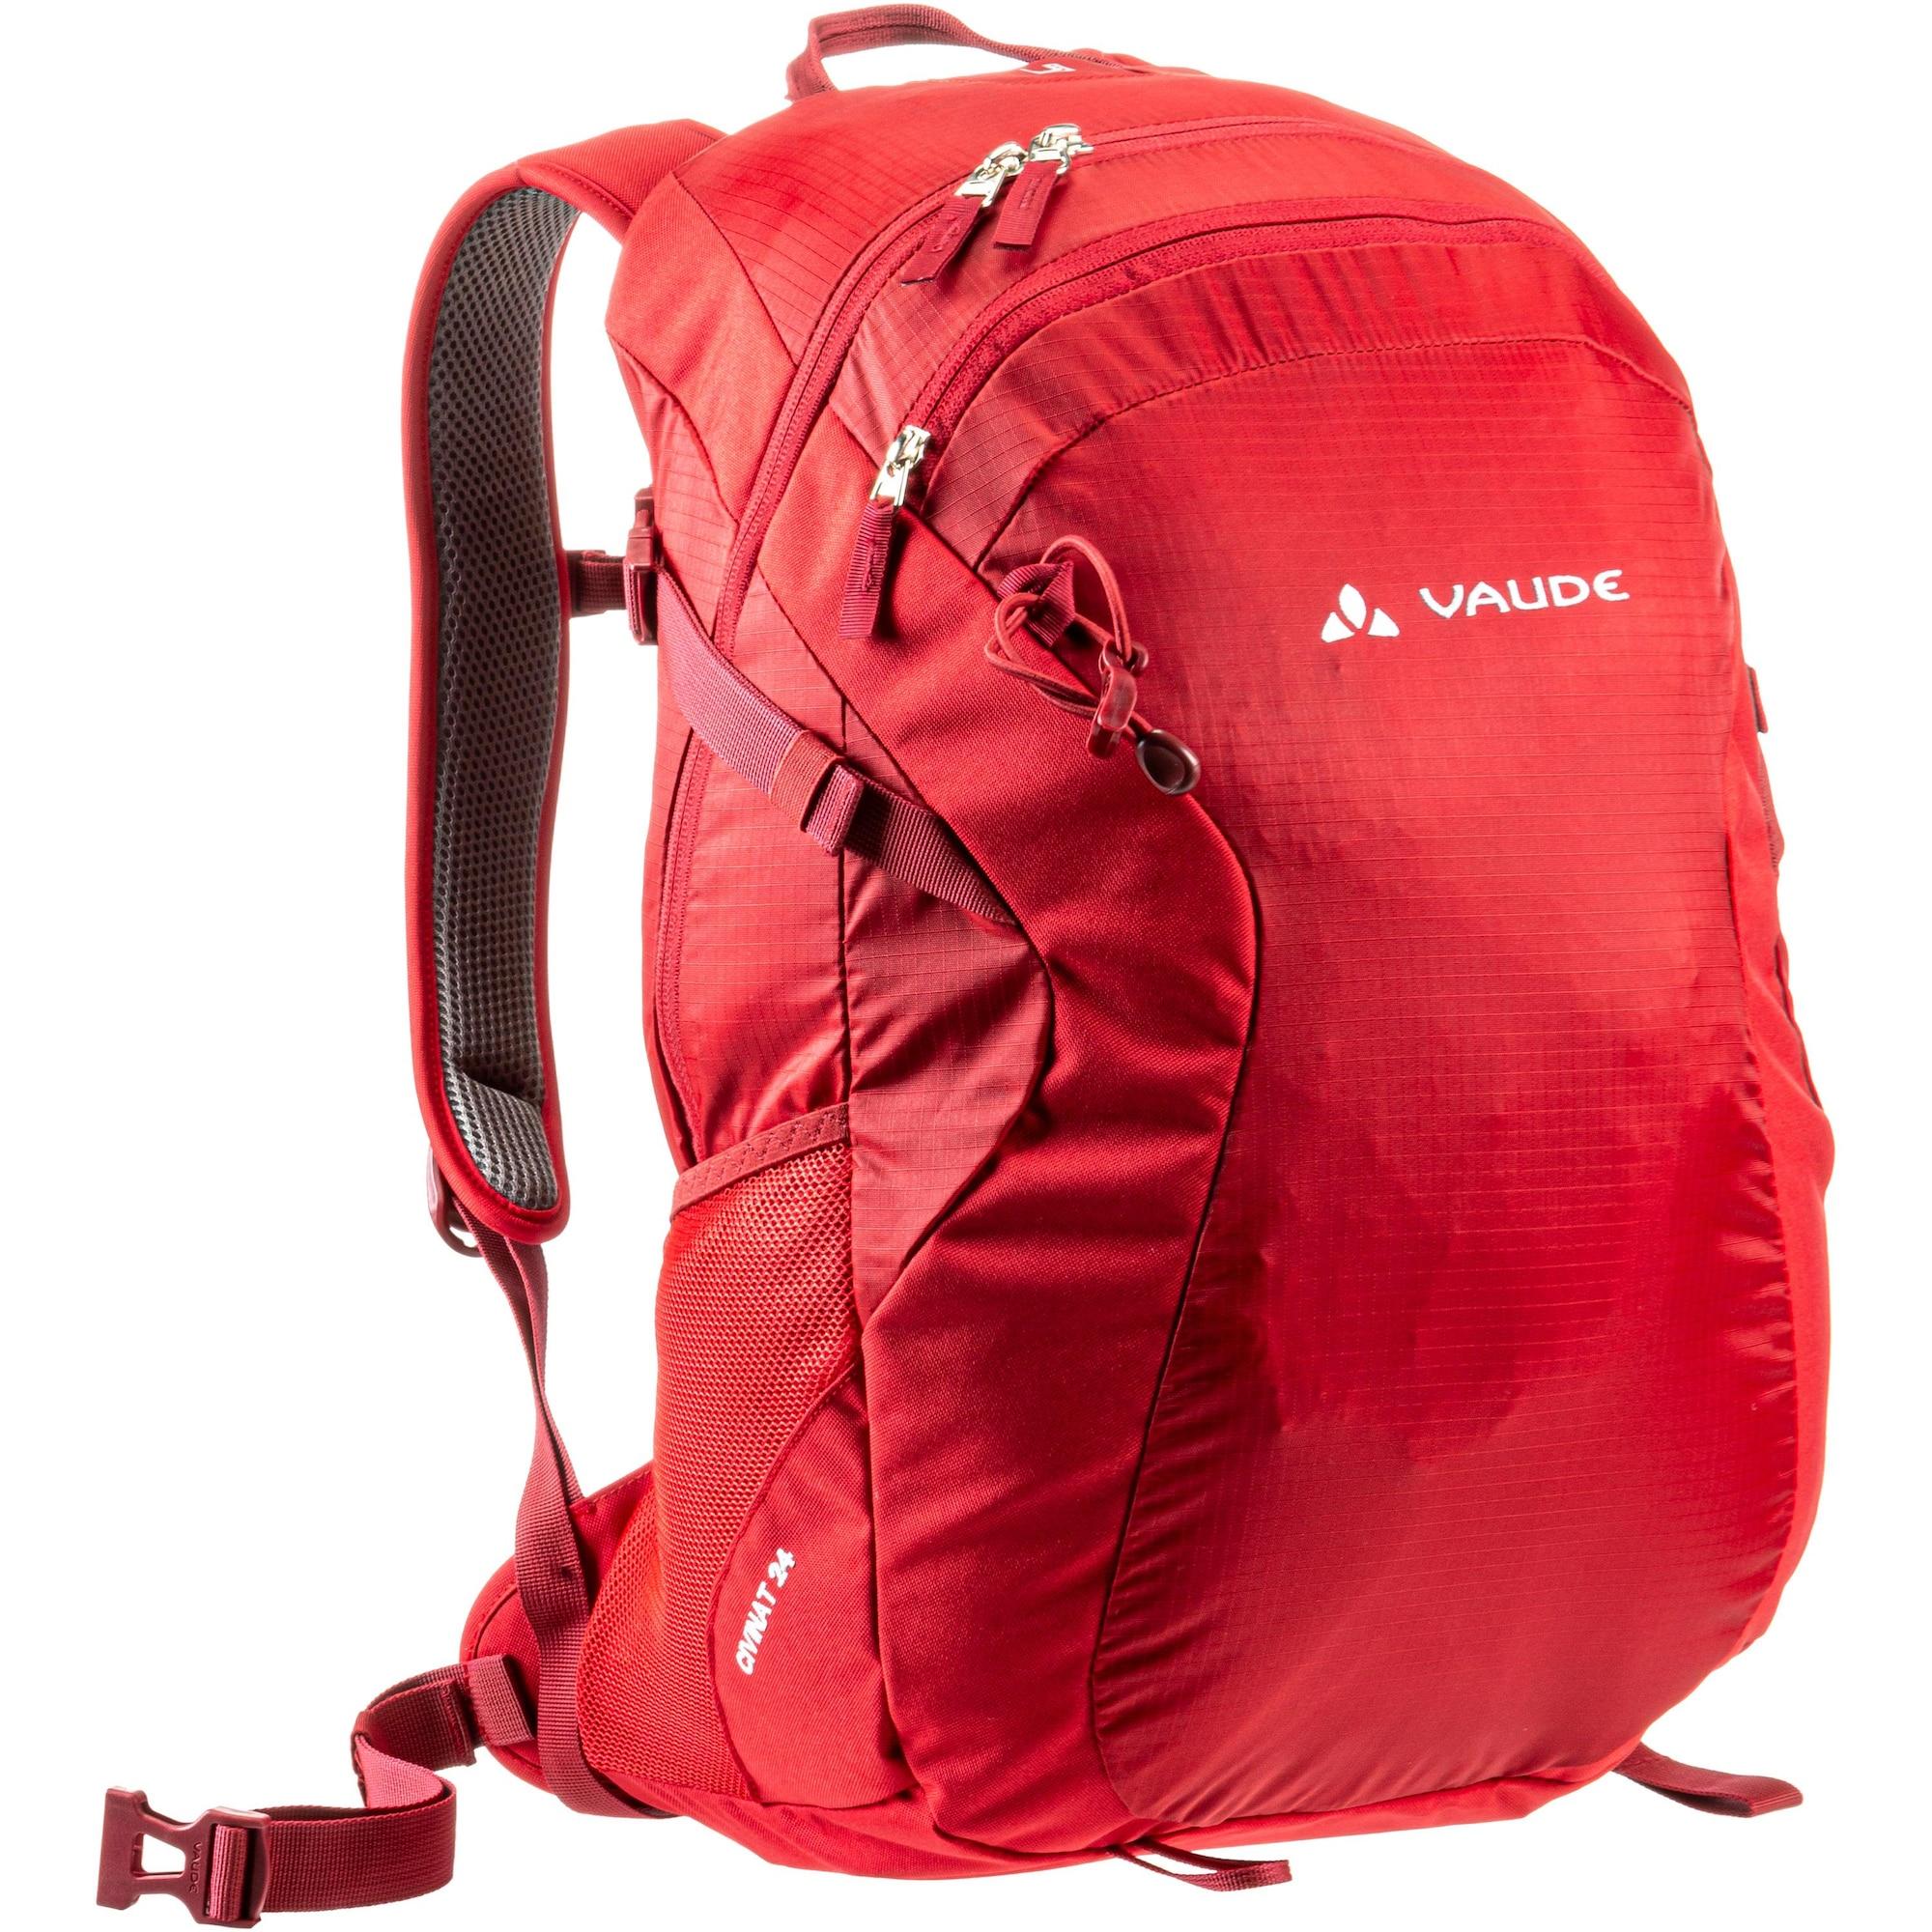 Daypack   Taschen > Rucksäcke > Tagesrucksäcke   Vaude